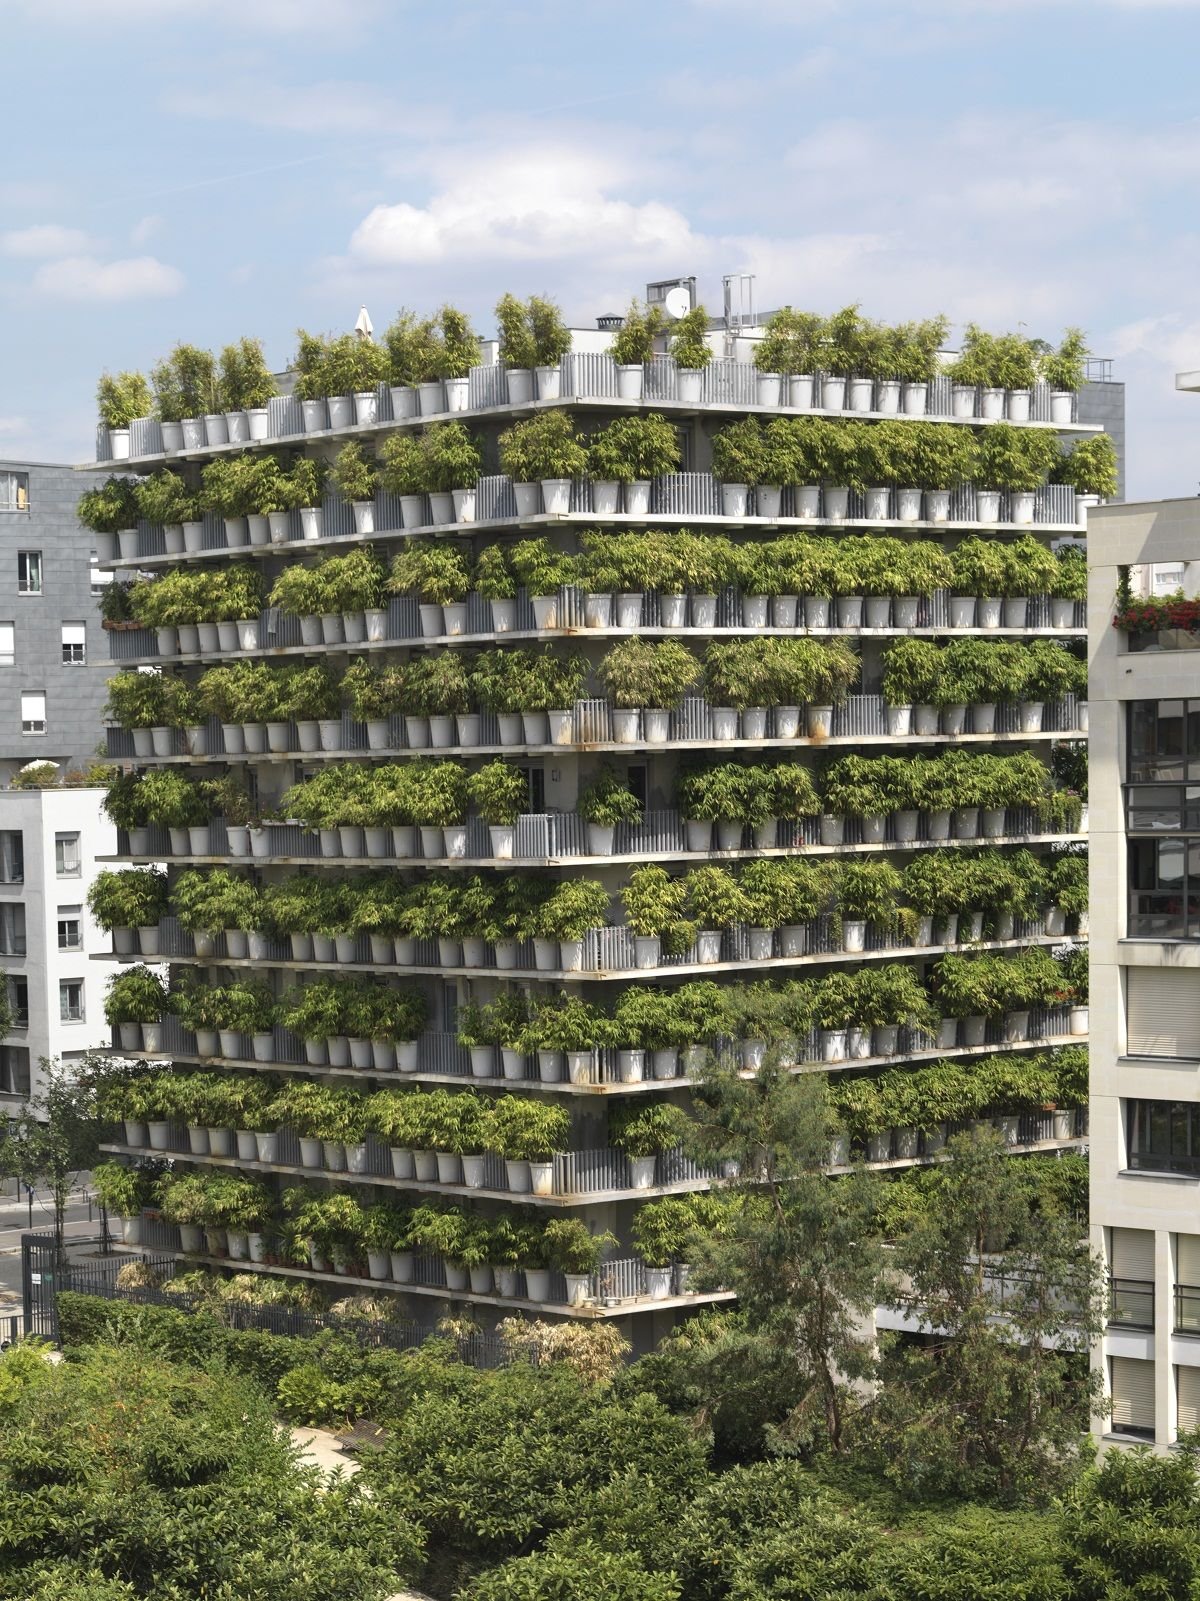 Immeubles verts une tendance croissante v g talisation urbaine pinterest architecture - Immeuble vegetal ...